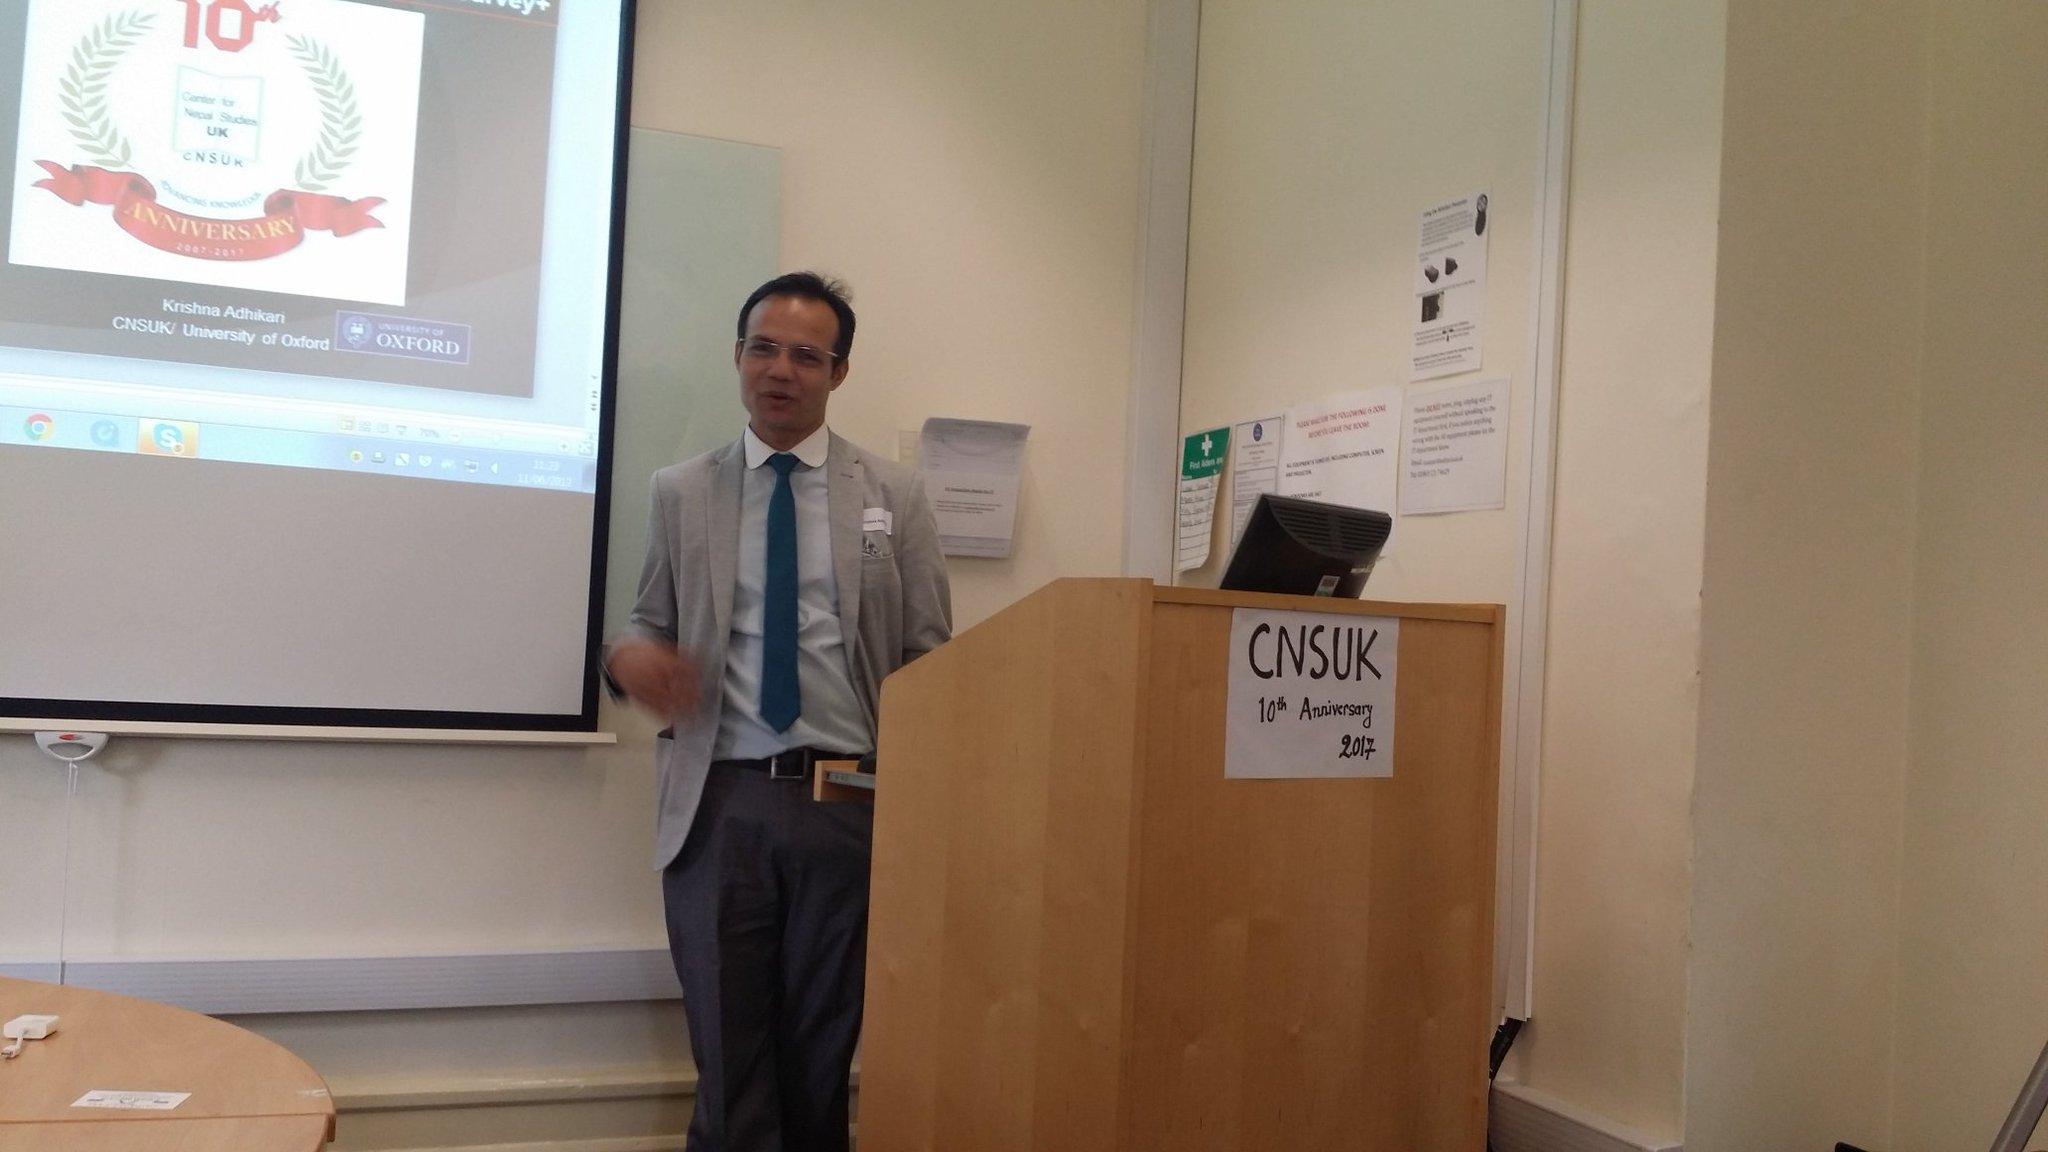 Dr Krishna Adhikari presenting on Nepalis in the UK #CNSUK10 https://t.co/ihpKVjlY2v